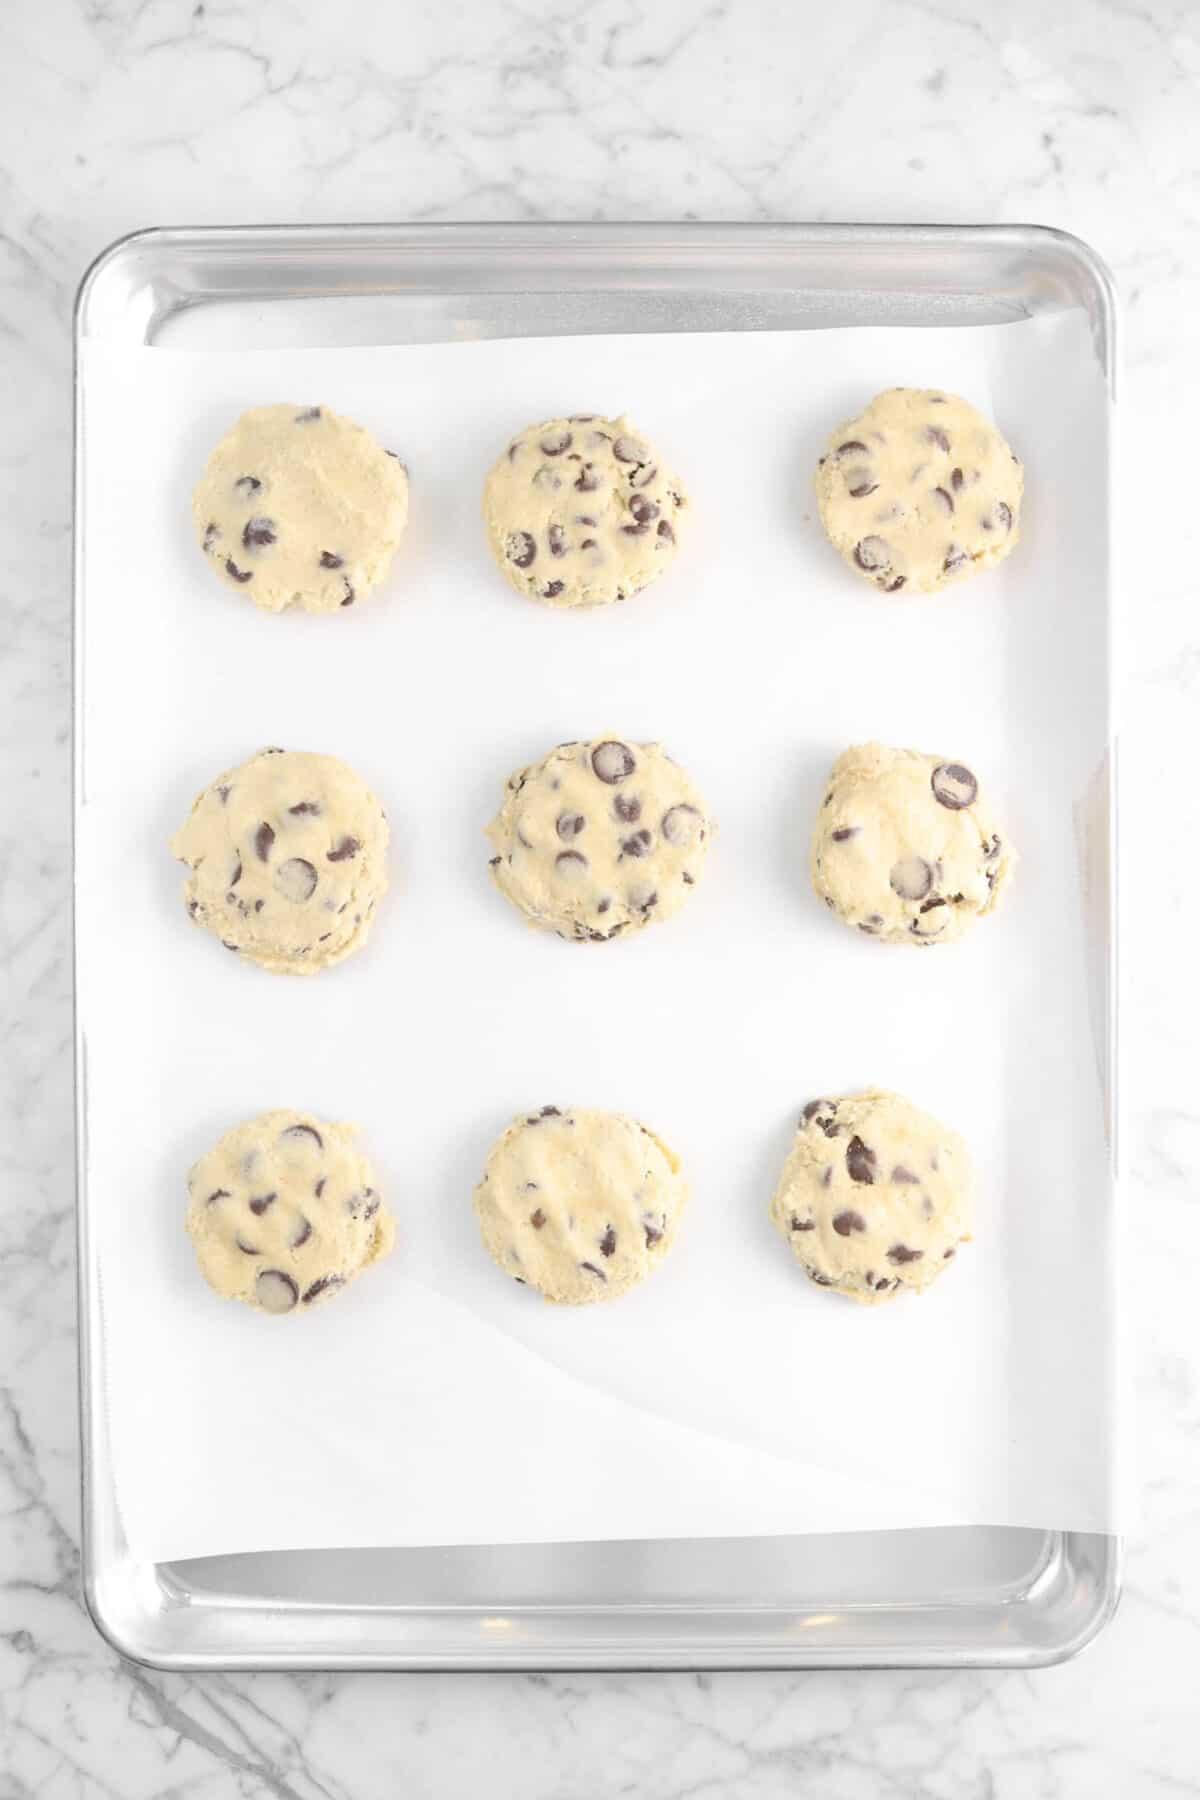 nine cookies on a baking sheet